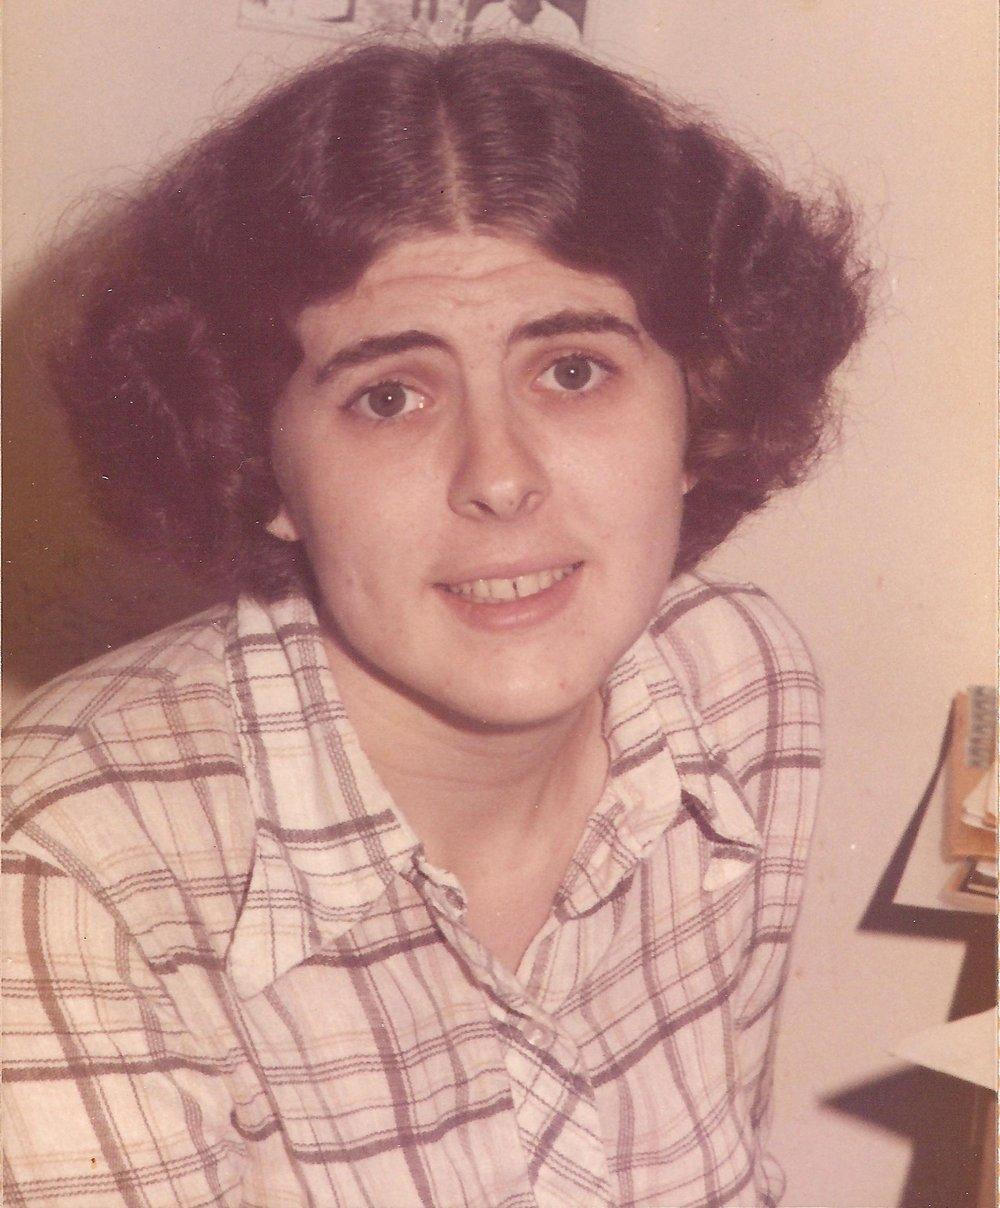 Irene Vartanoff